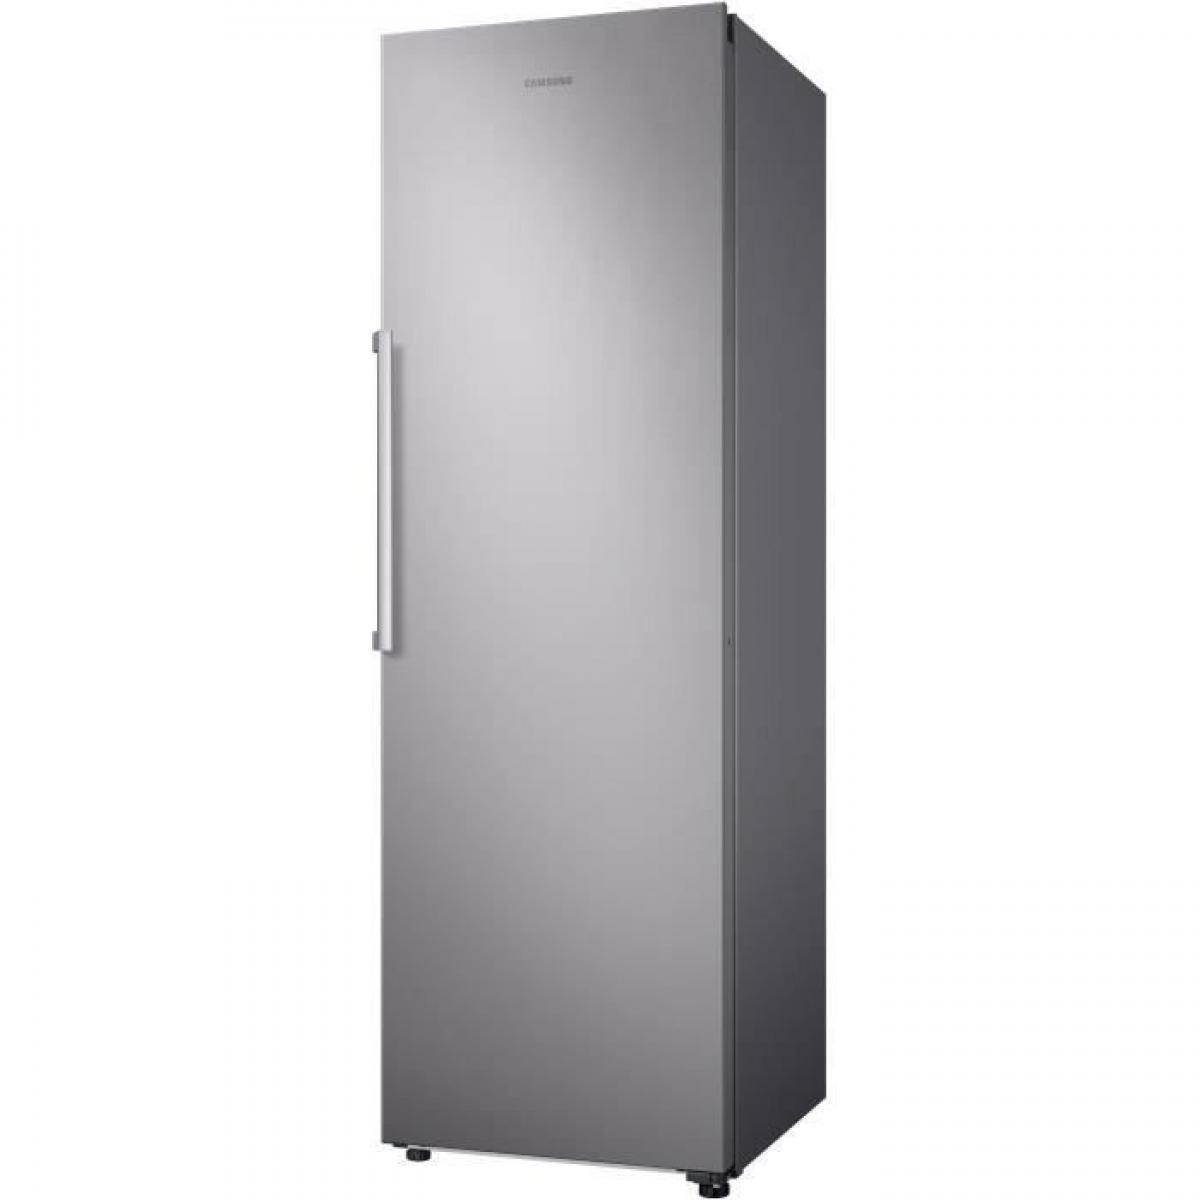 Samsung Samsung Rr39m7000sa - Refrigerateur 1 Porte - 385 L - Froid Ventile Integral - A+ - L 59,5 X H 185,5 Cm - Inox